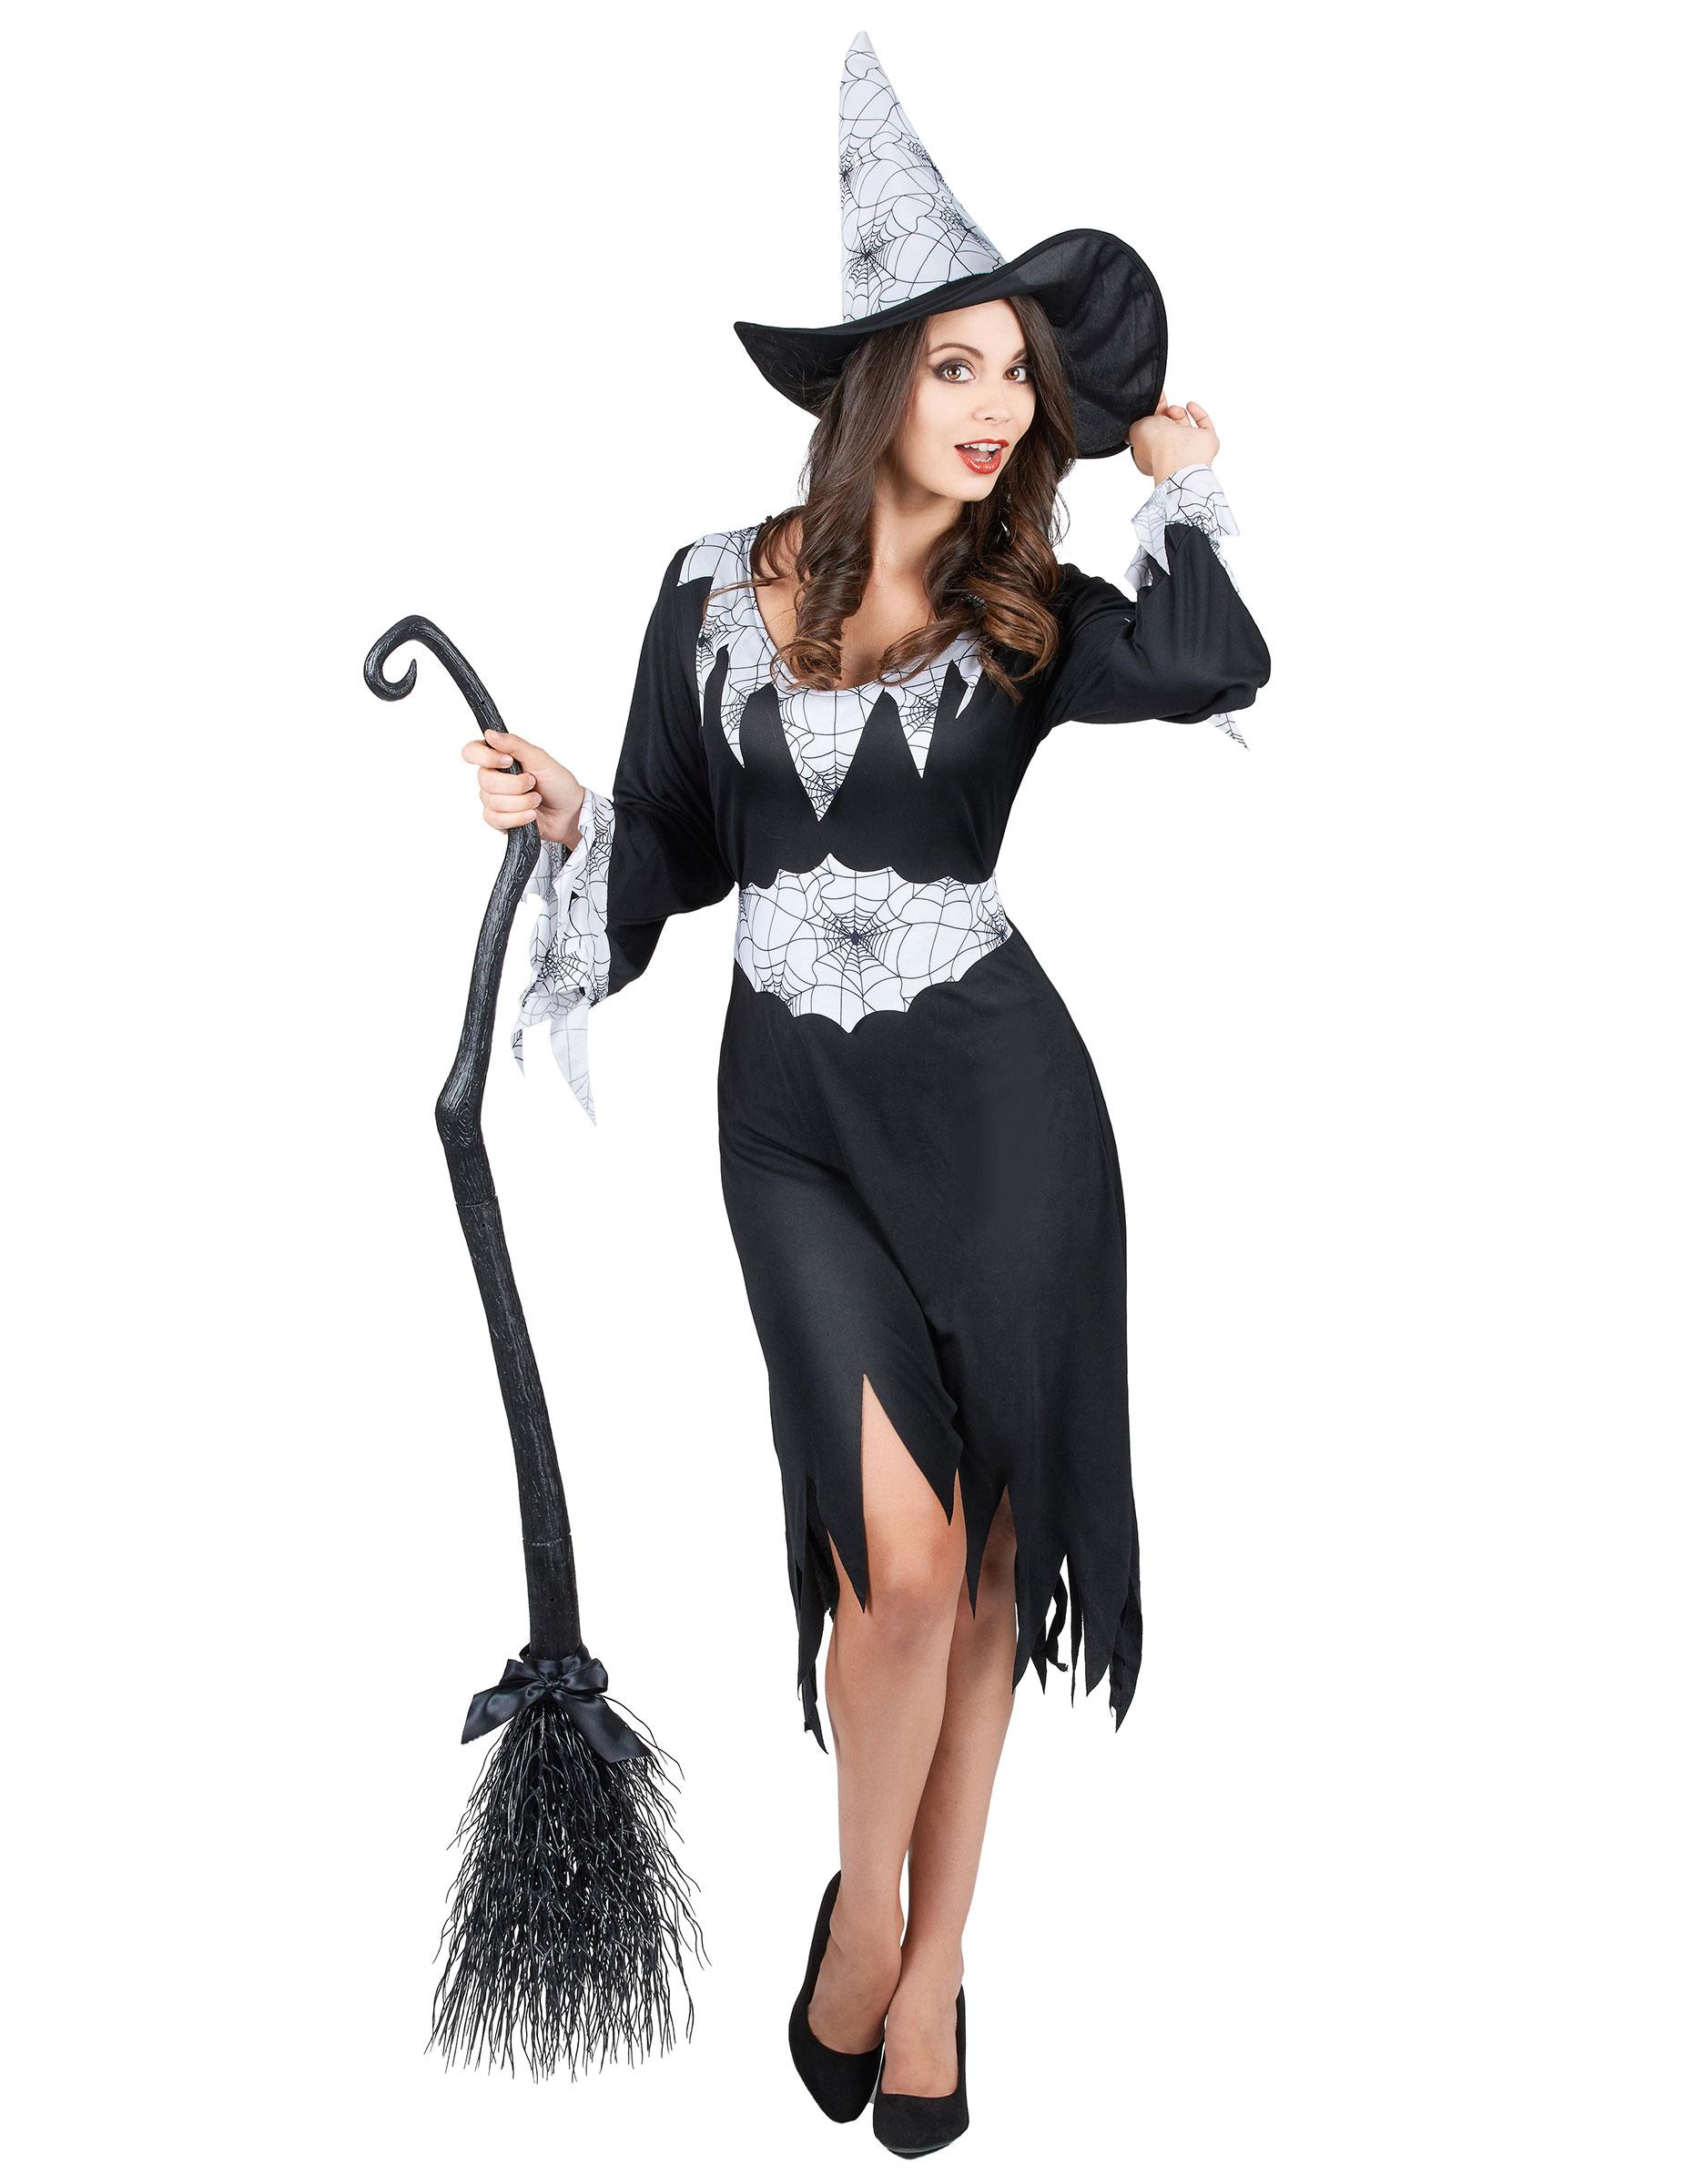 Costume per Halloween da strega per donna su VegaooParty 5b167a869cf0